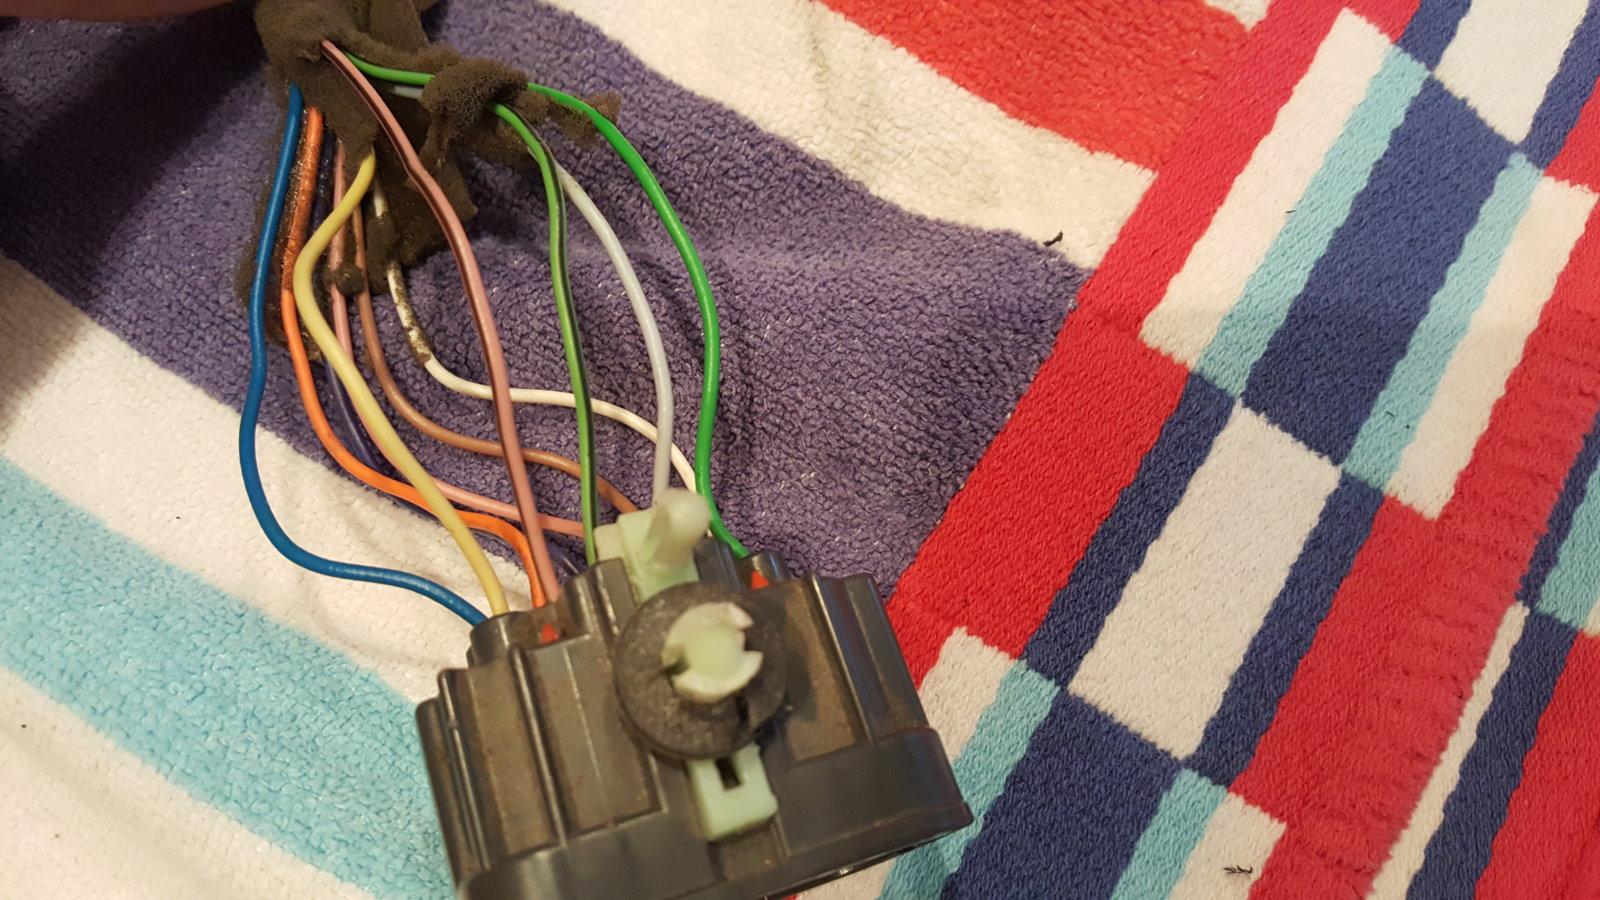 Superb Jeep Tj Sub Wire Diagram Wiring Library Wiring Cloud Mousmenurrecoveryedborg